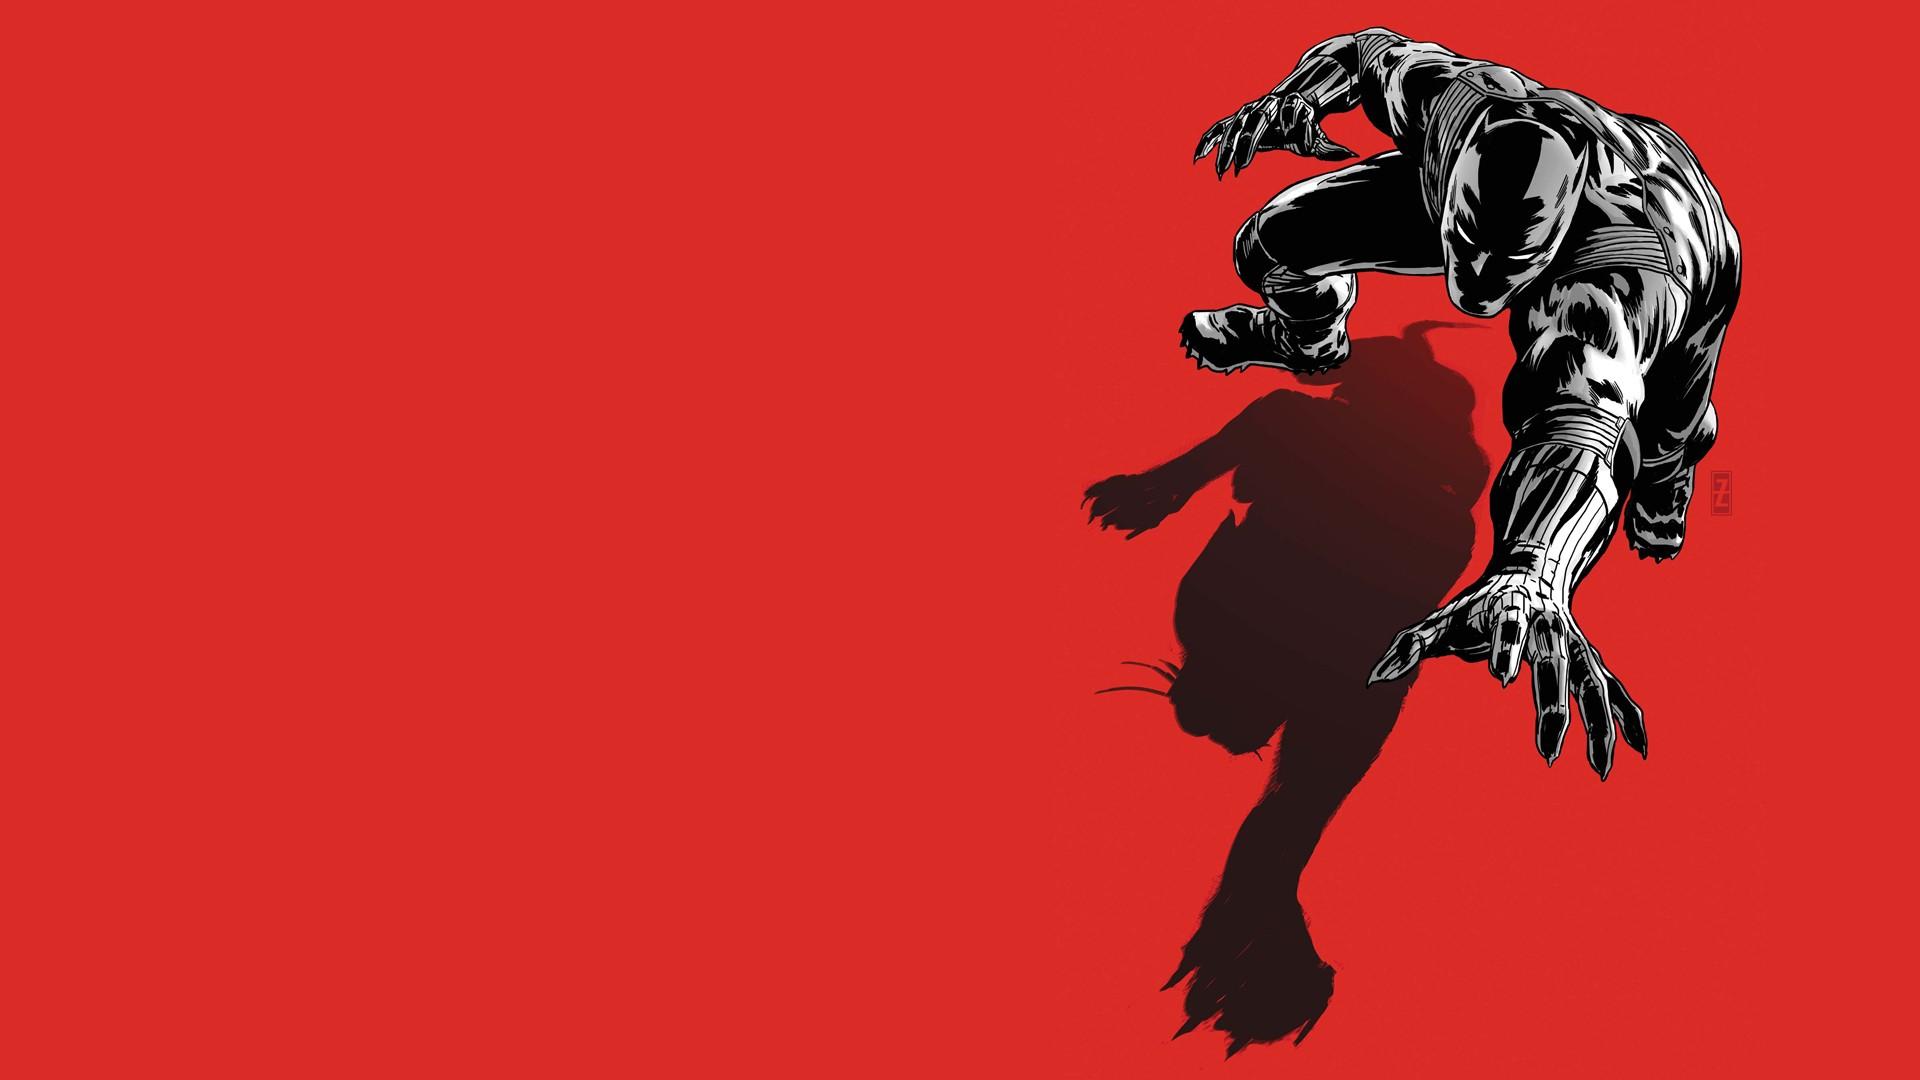 black panther hd wallpaper background